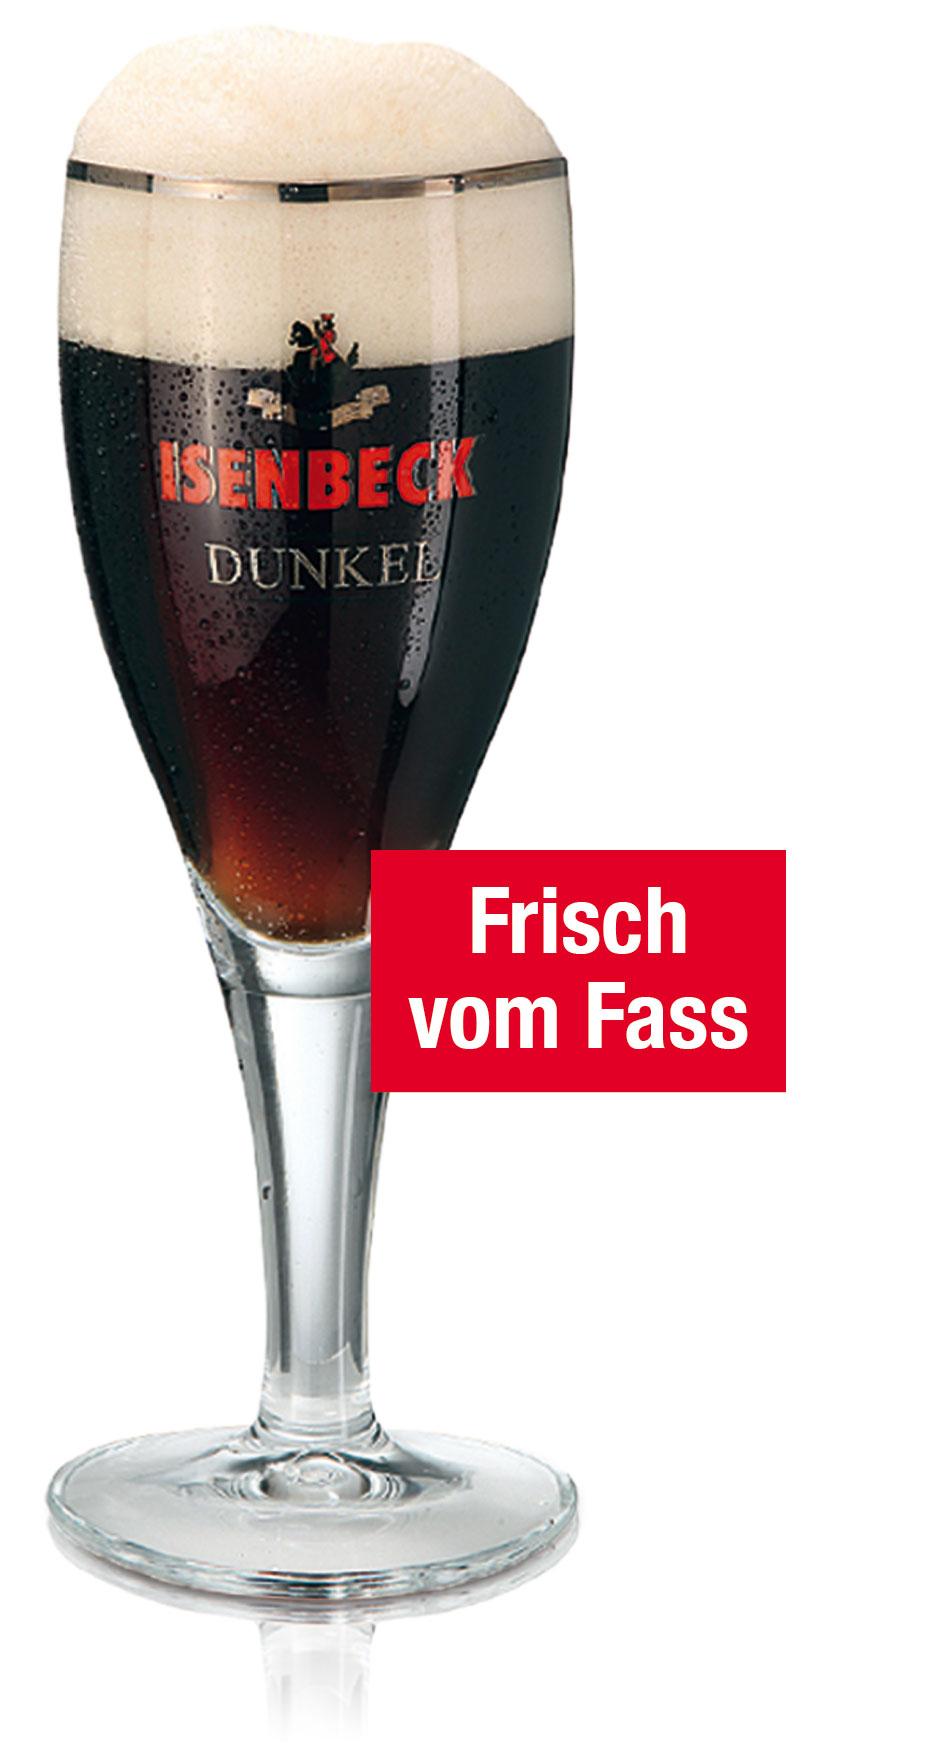 Isenbeck Dunkel